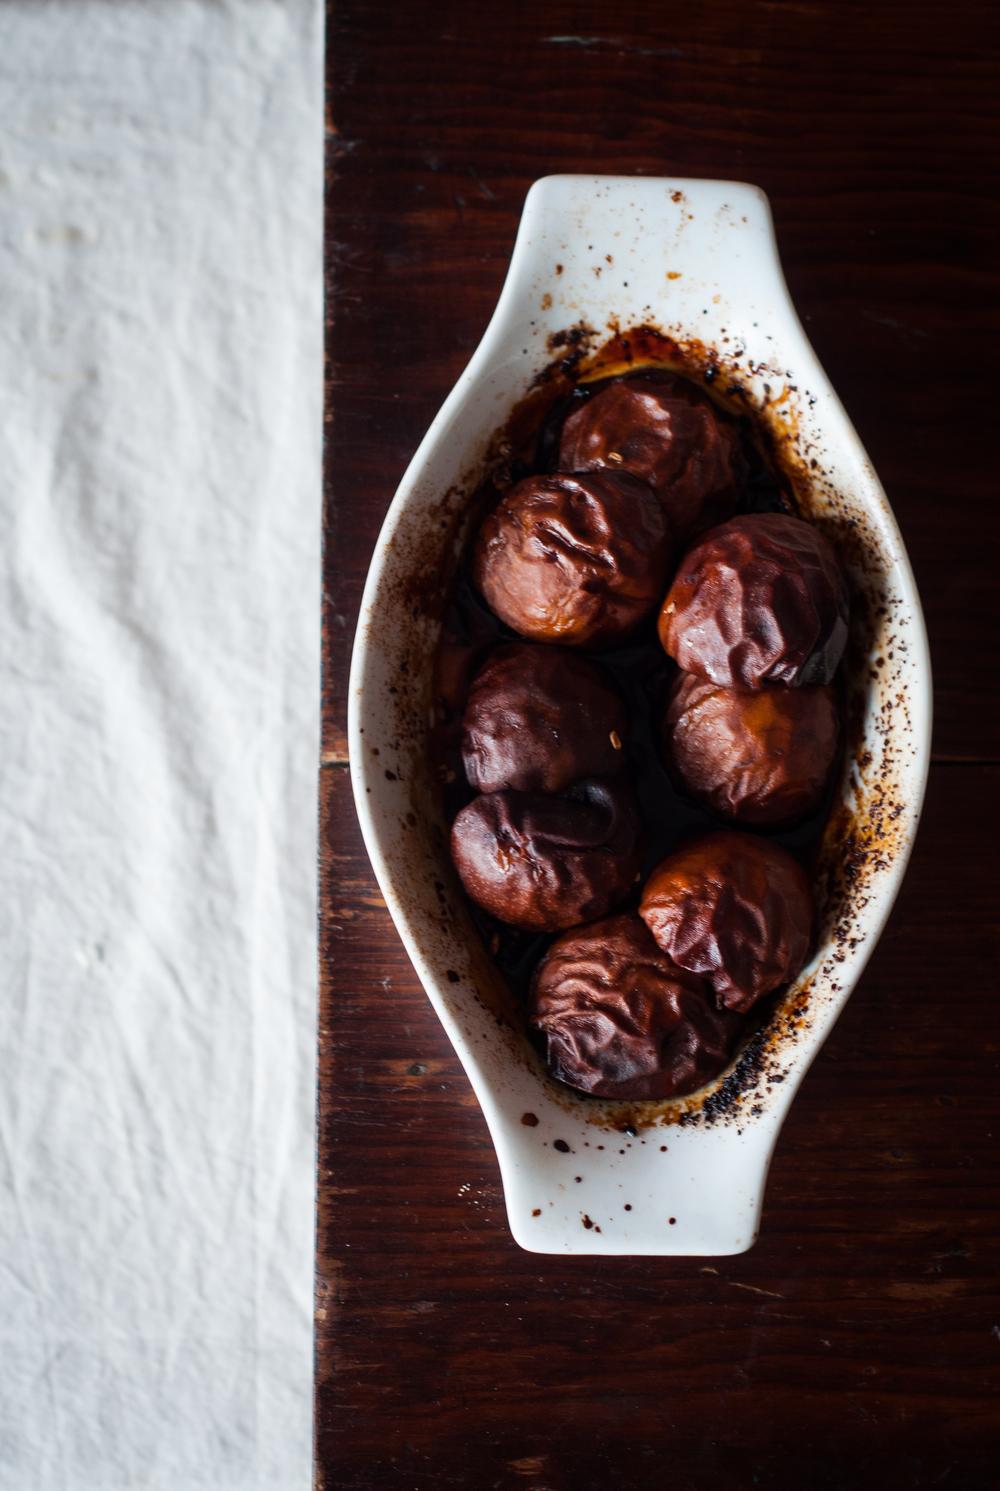 cardamom-roasted-pears.jpg